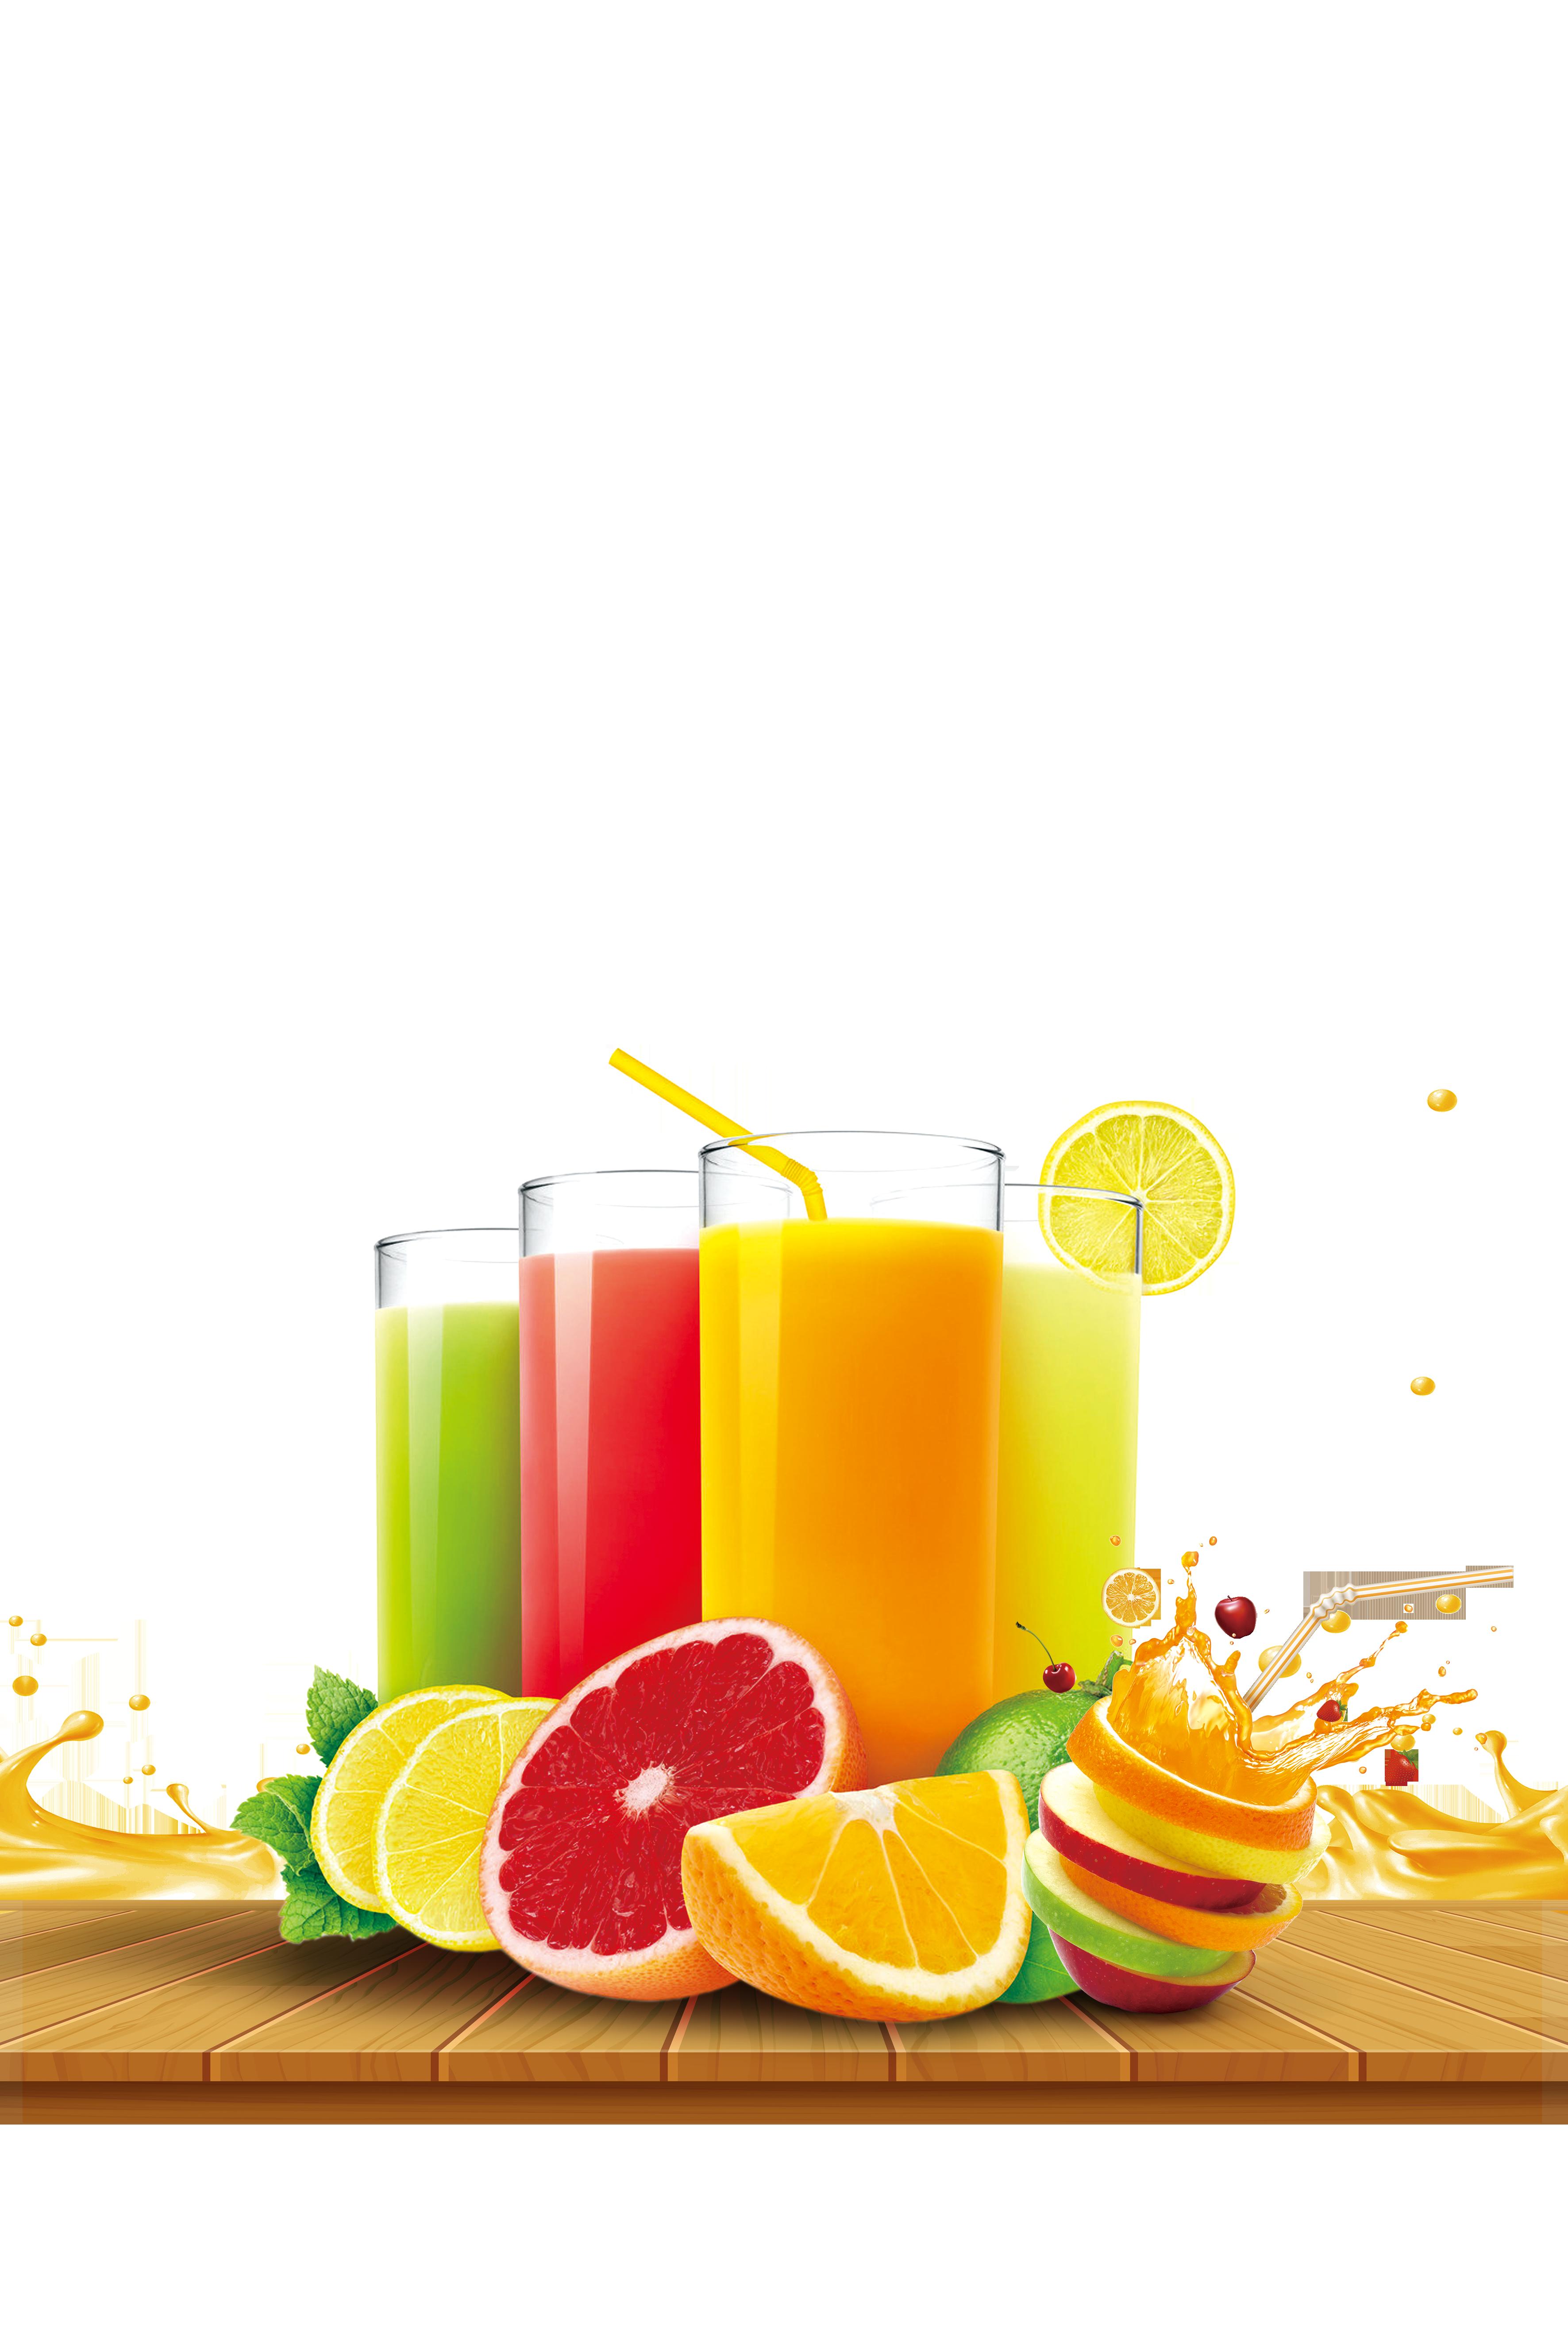 Lemon Colorful Juices Drink Juice Fruit Orange Orange Juice Drinks Citrus Drinks Non Alcoholic Drinks